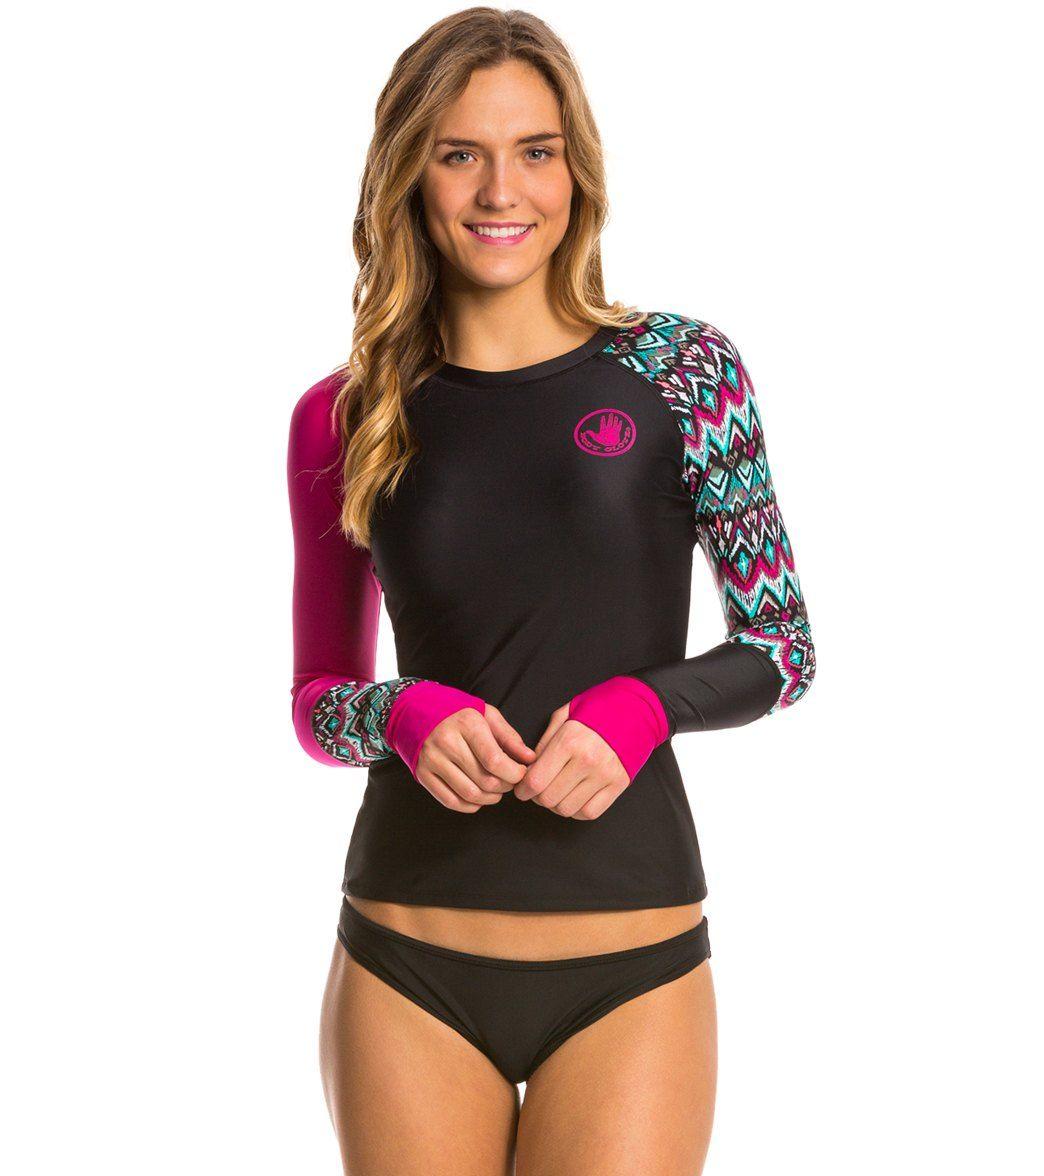 Body Glove Breathe Women's Ensenada Sleek Long Sleeve Rash Guard at  SwimOutlet.com - Free Shipping